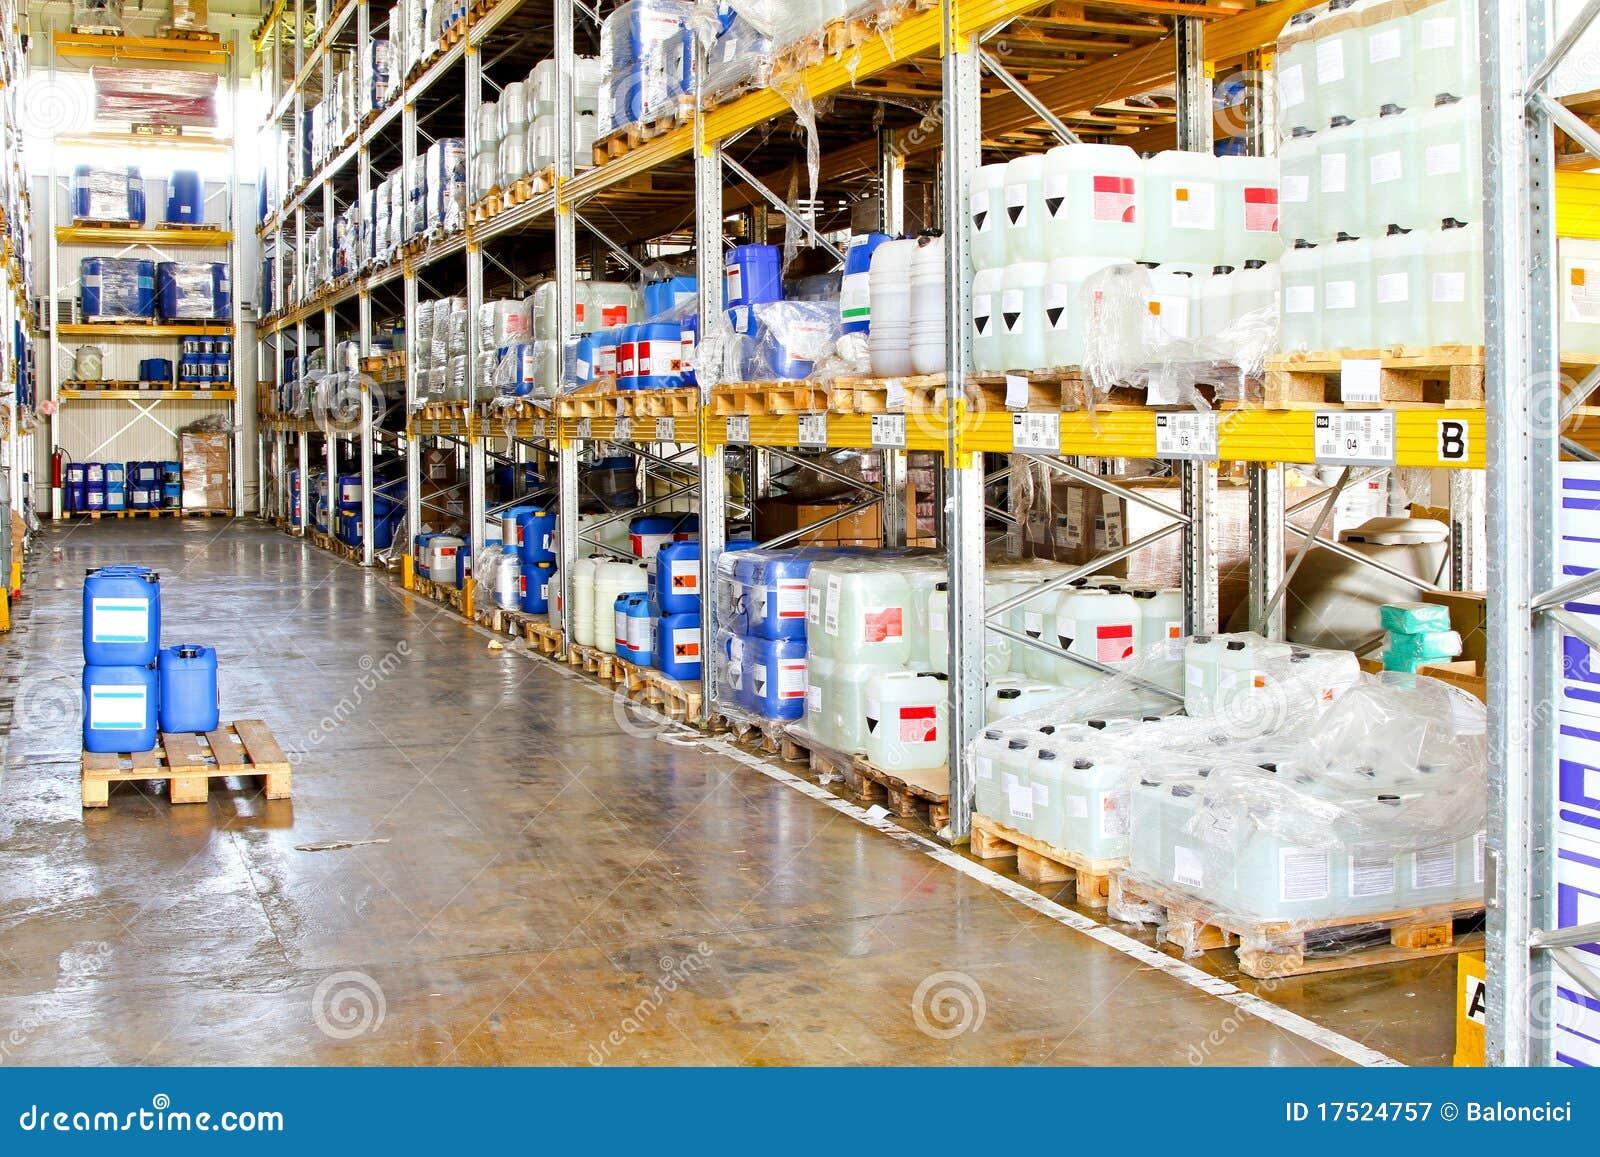 Chemical warehouse